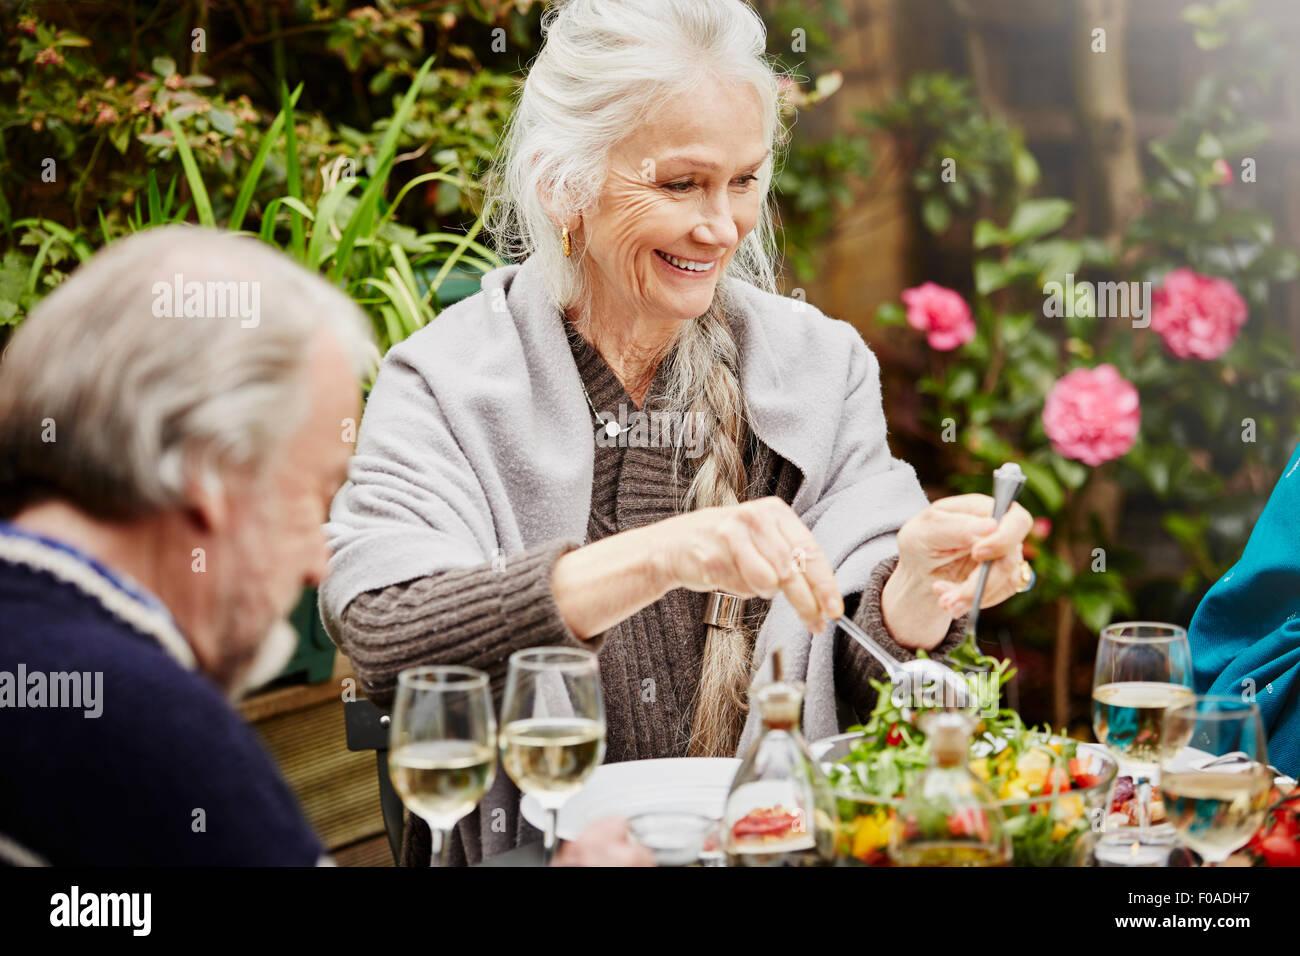 Senior friends eating meal in garden - Stock Image